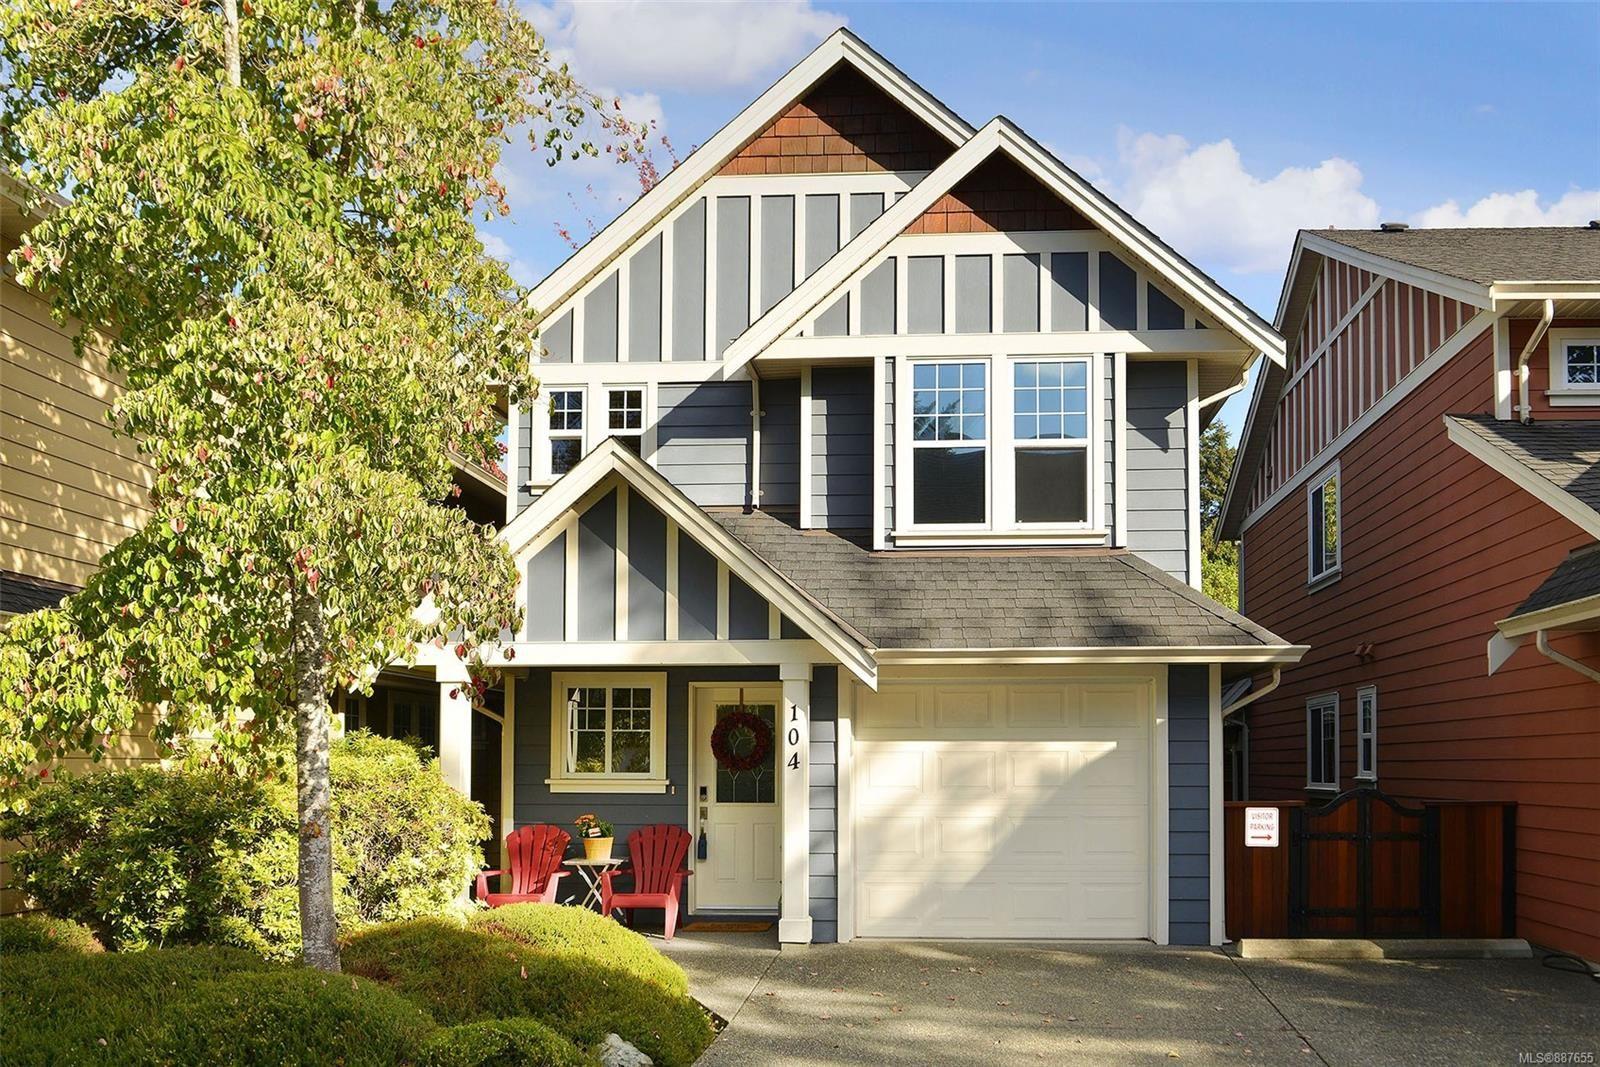 Main Photo: 104 724 LARKHALL Rd in : La Langford Proper House for sale (Langford)  : MLS®# 887655